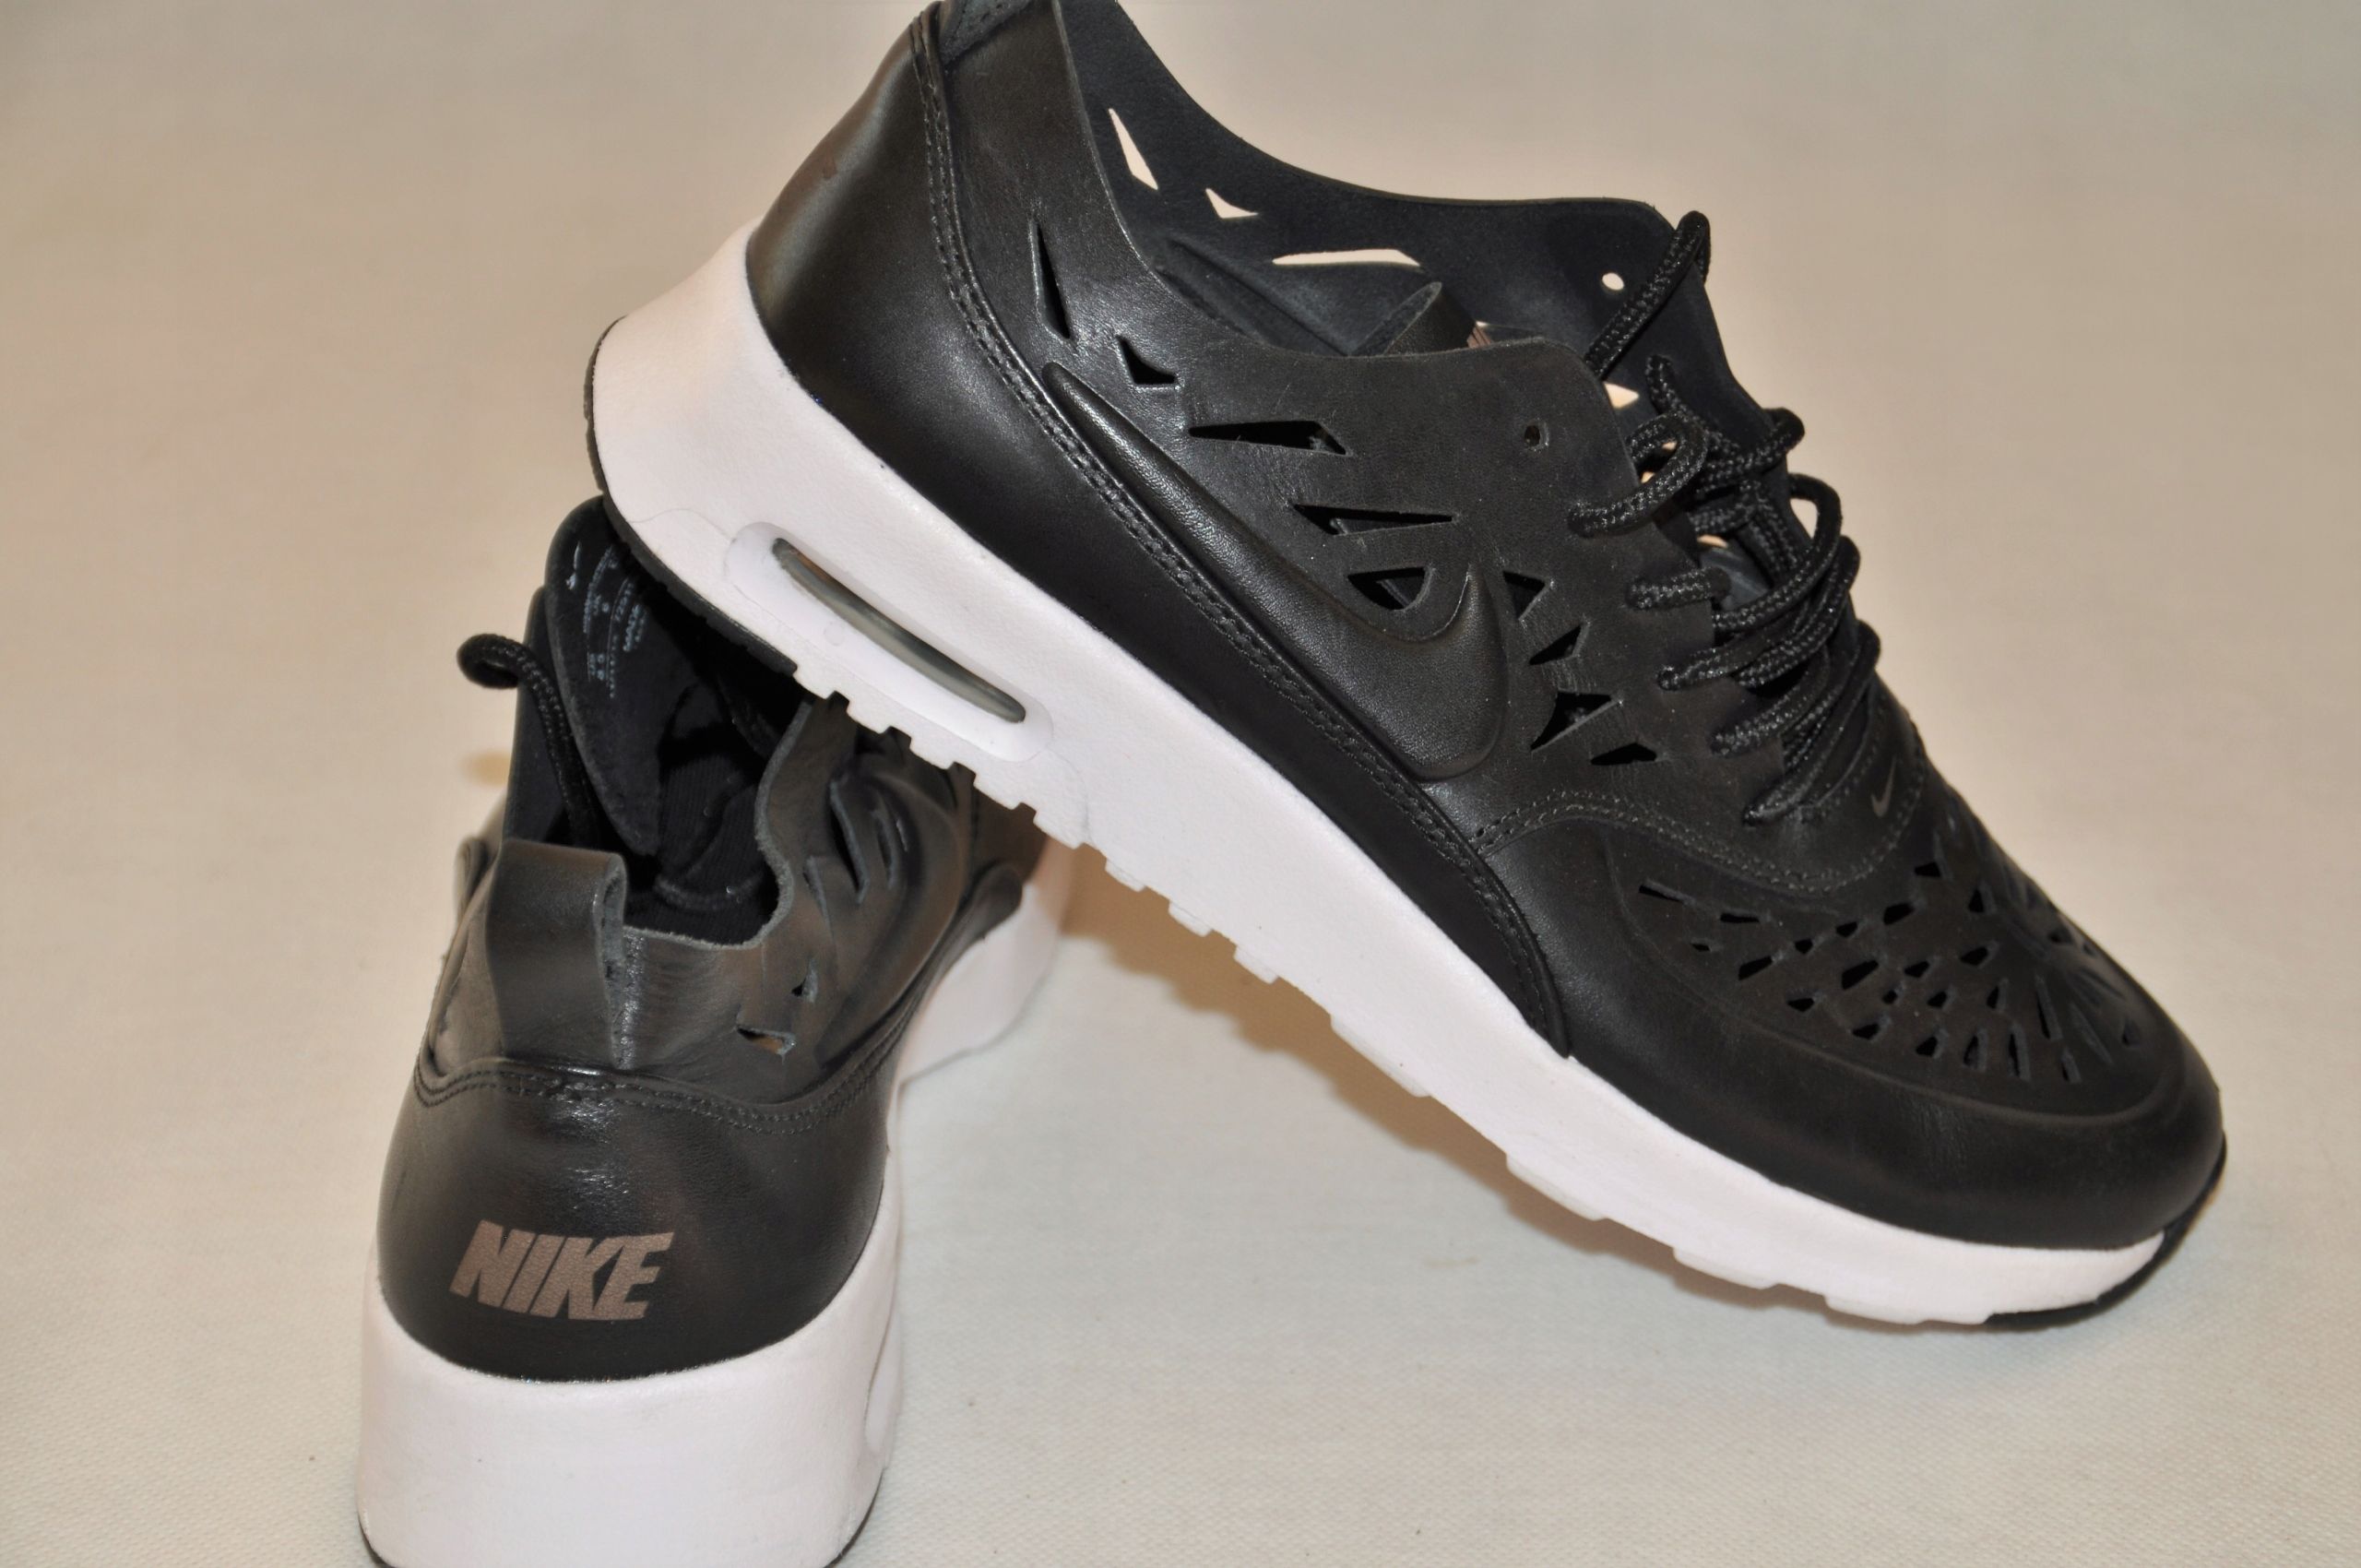 Piękny Design Obuwie damskie Buty Nike Wmns Air Max 97 Ultra